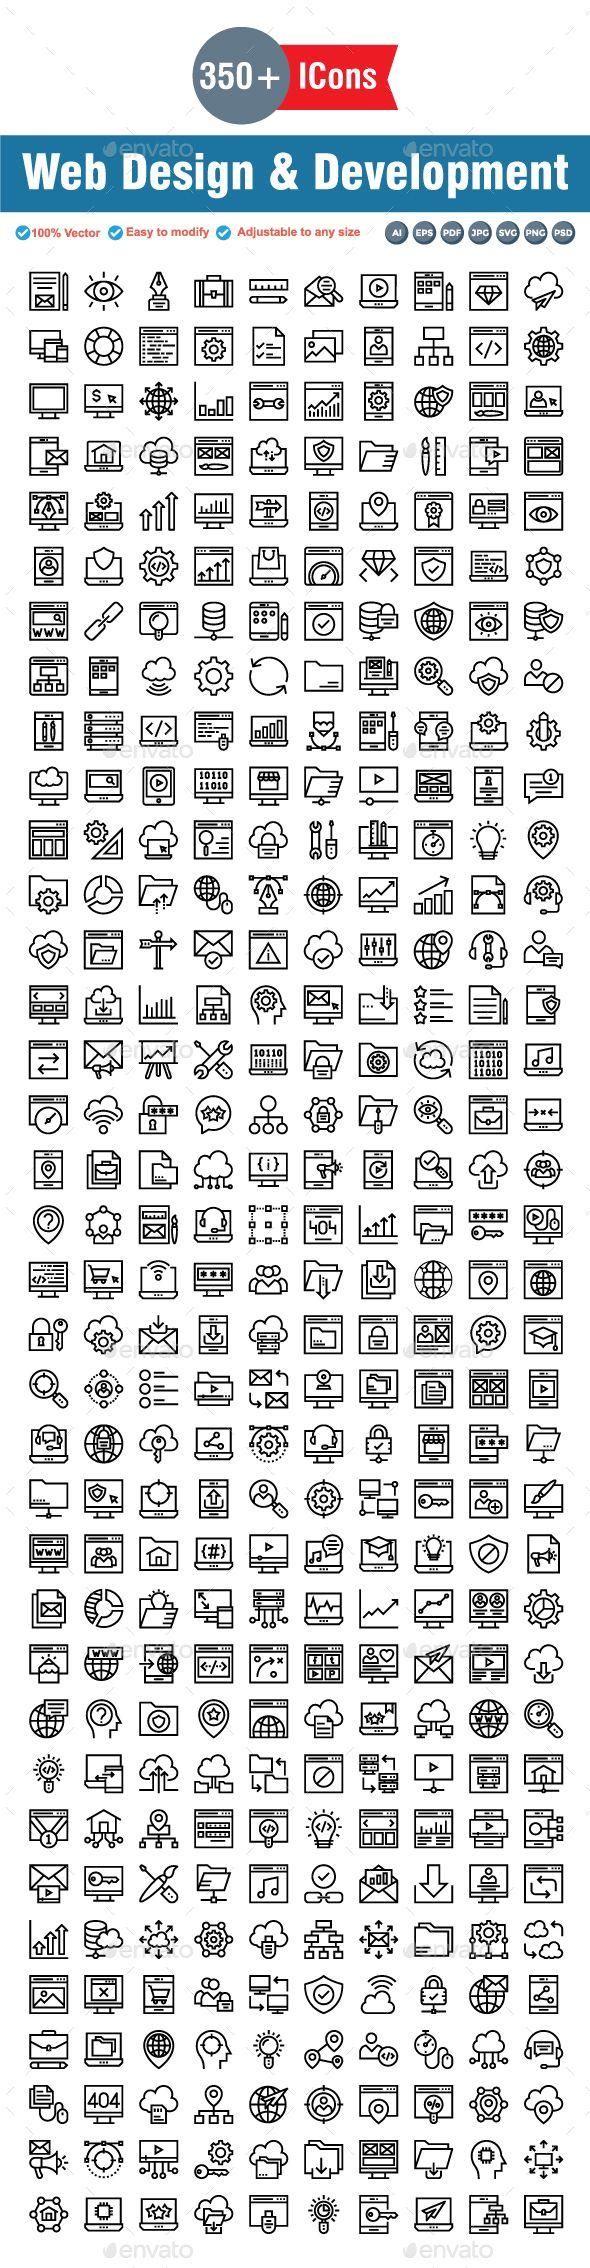 Web Design & Development Line icons Web development